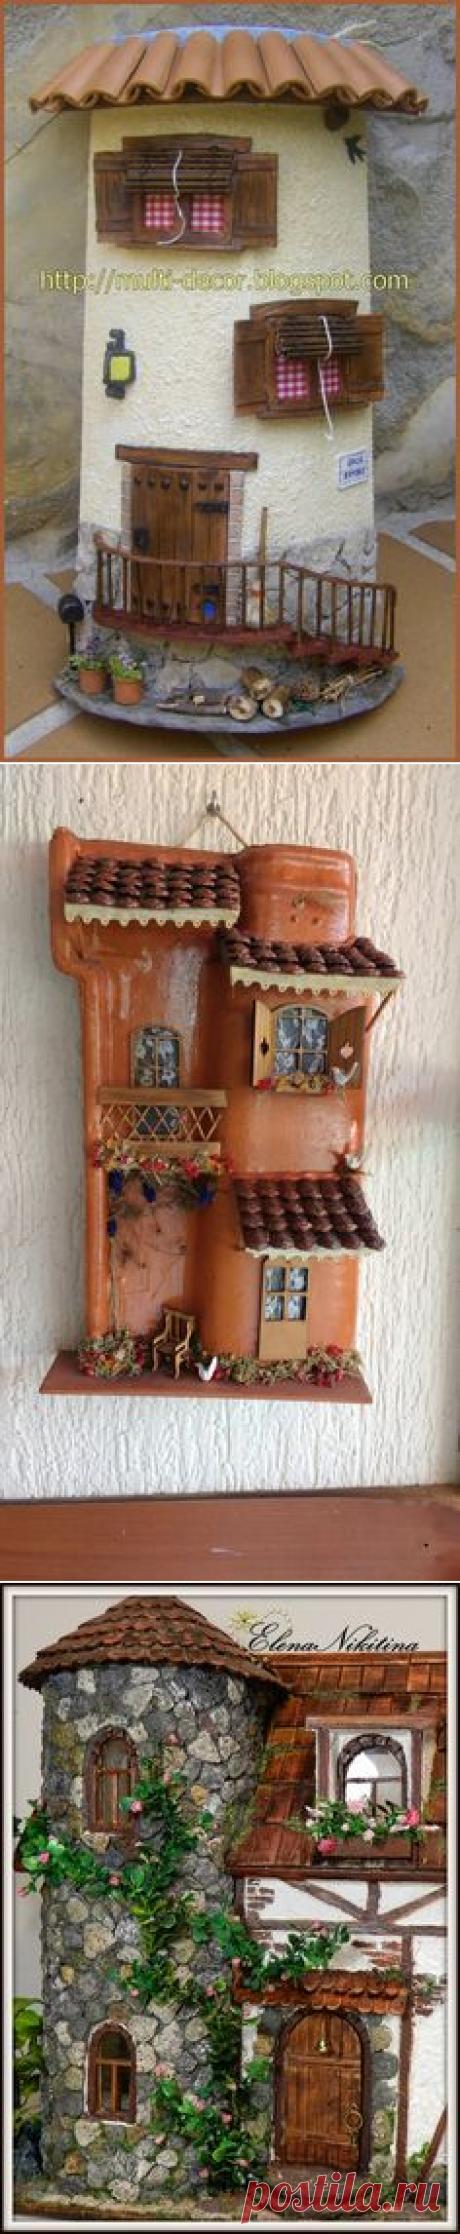 Light House   Lil'l Houses - Craft   Madeira, Artesanato and Lights